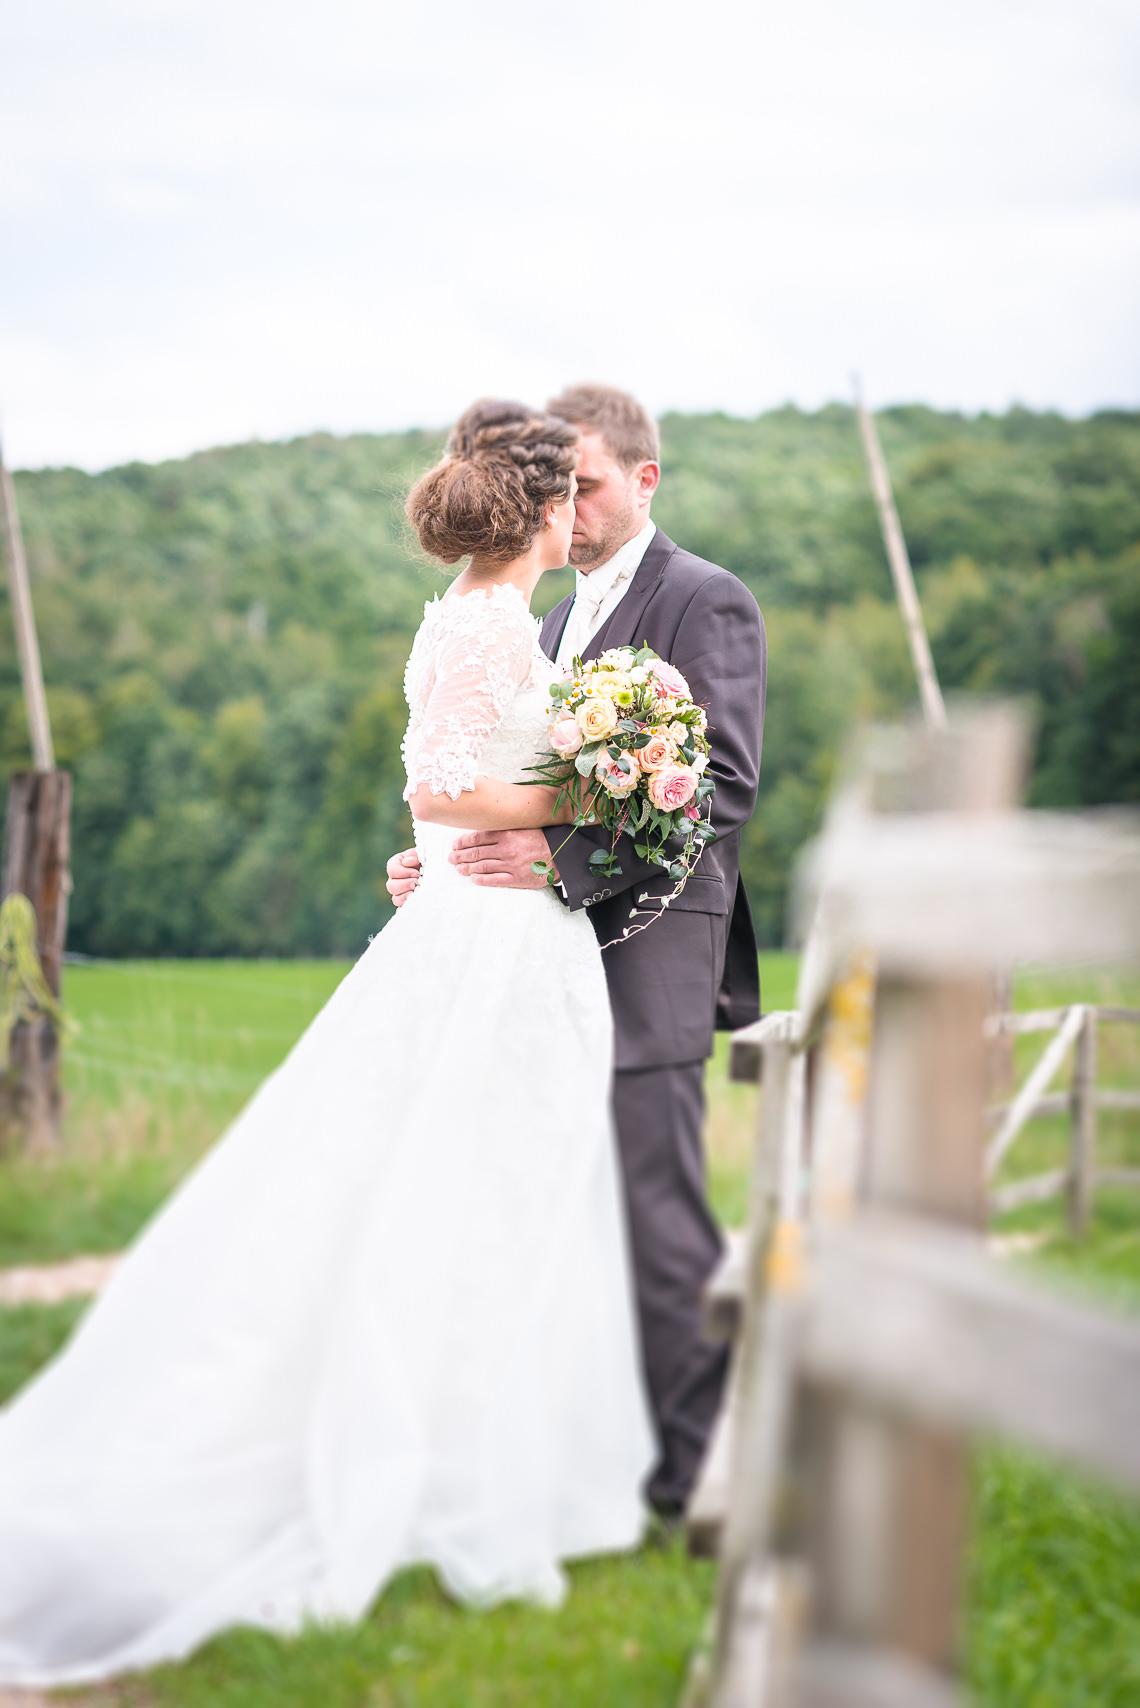 0066_20150905_CKE_4300_Hochzeit_Michaela_Andreas-PS_